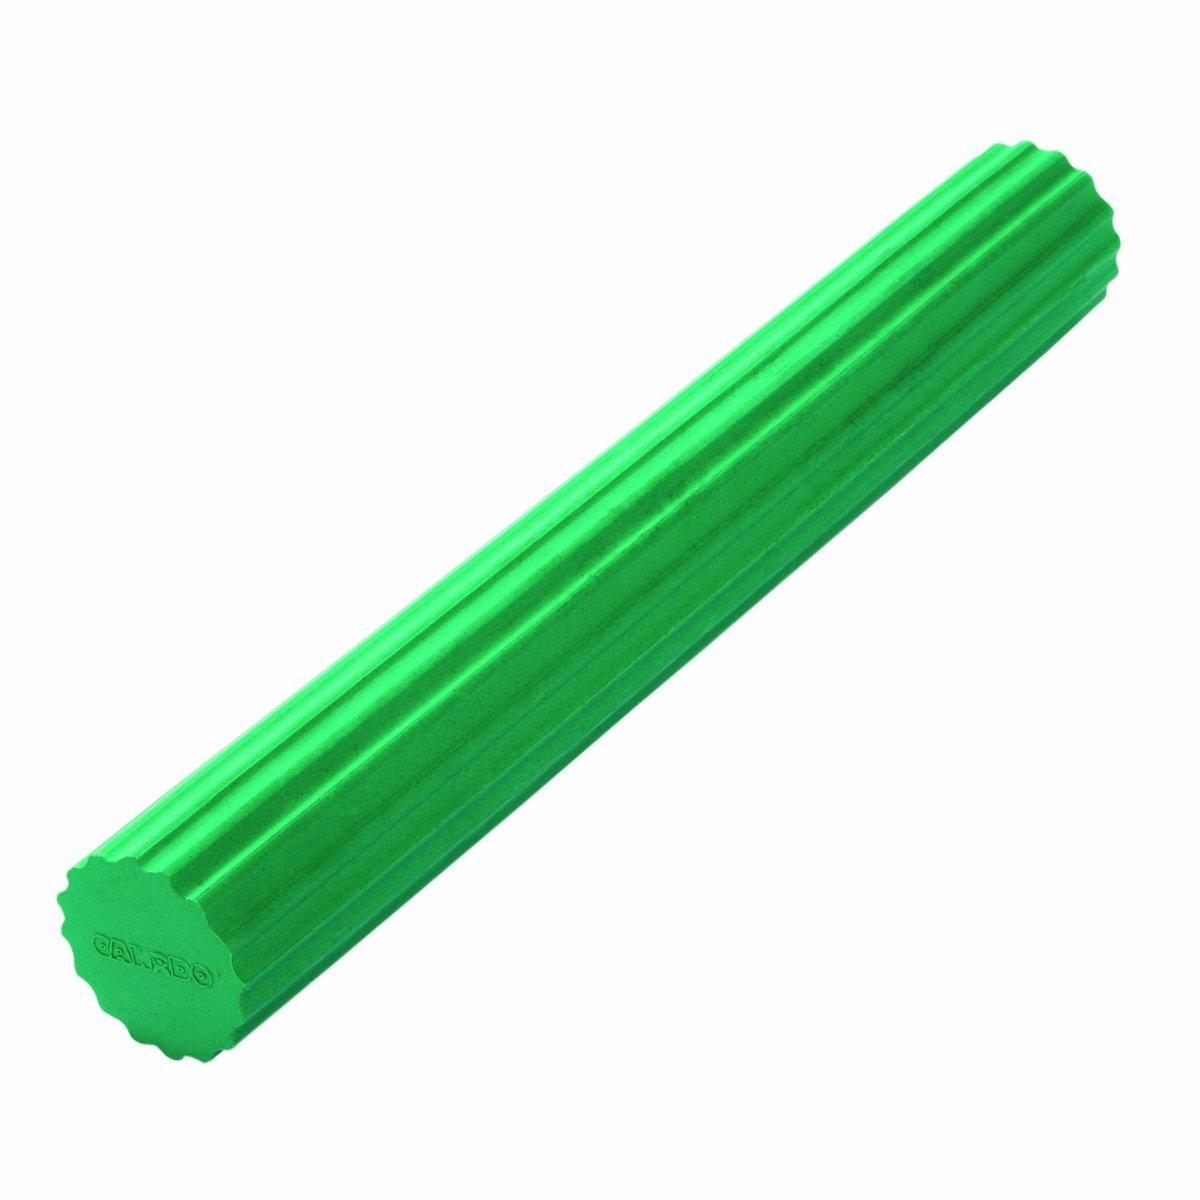 Cando 10-1513 Green Twist-n-Bend Hand Exerciser, Medium Resistance: Industrial & Scientific